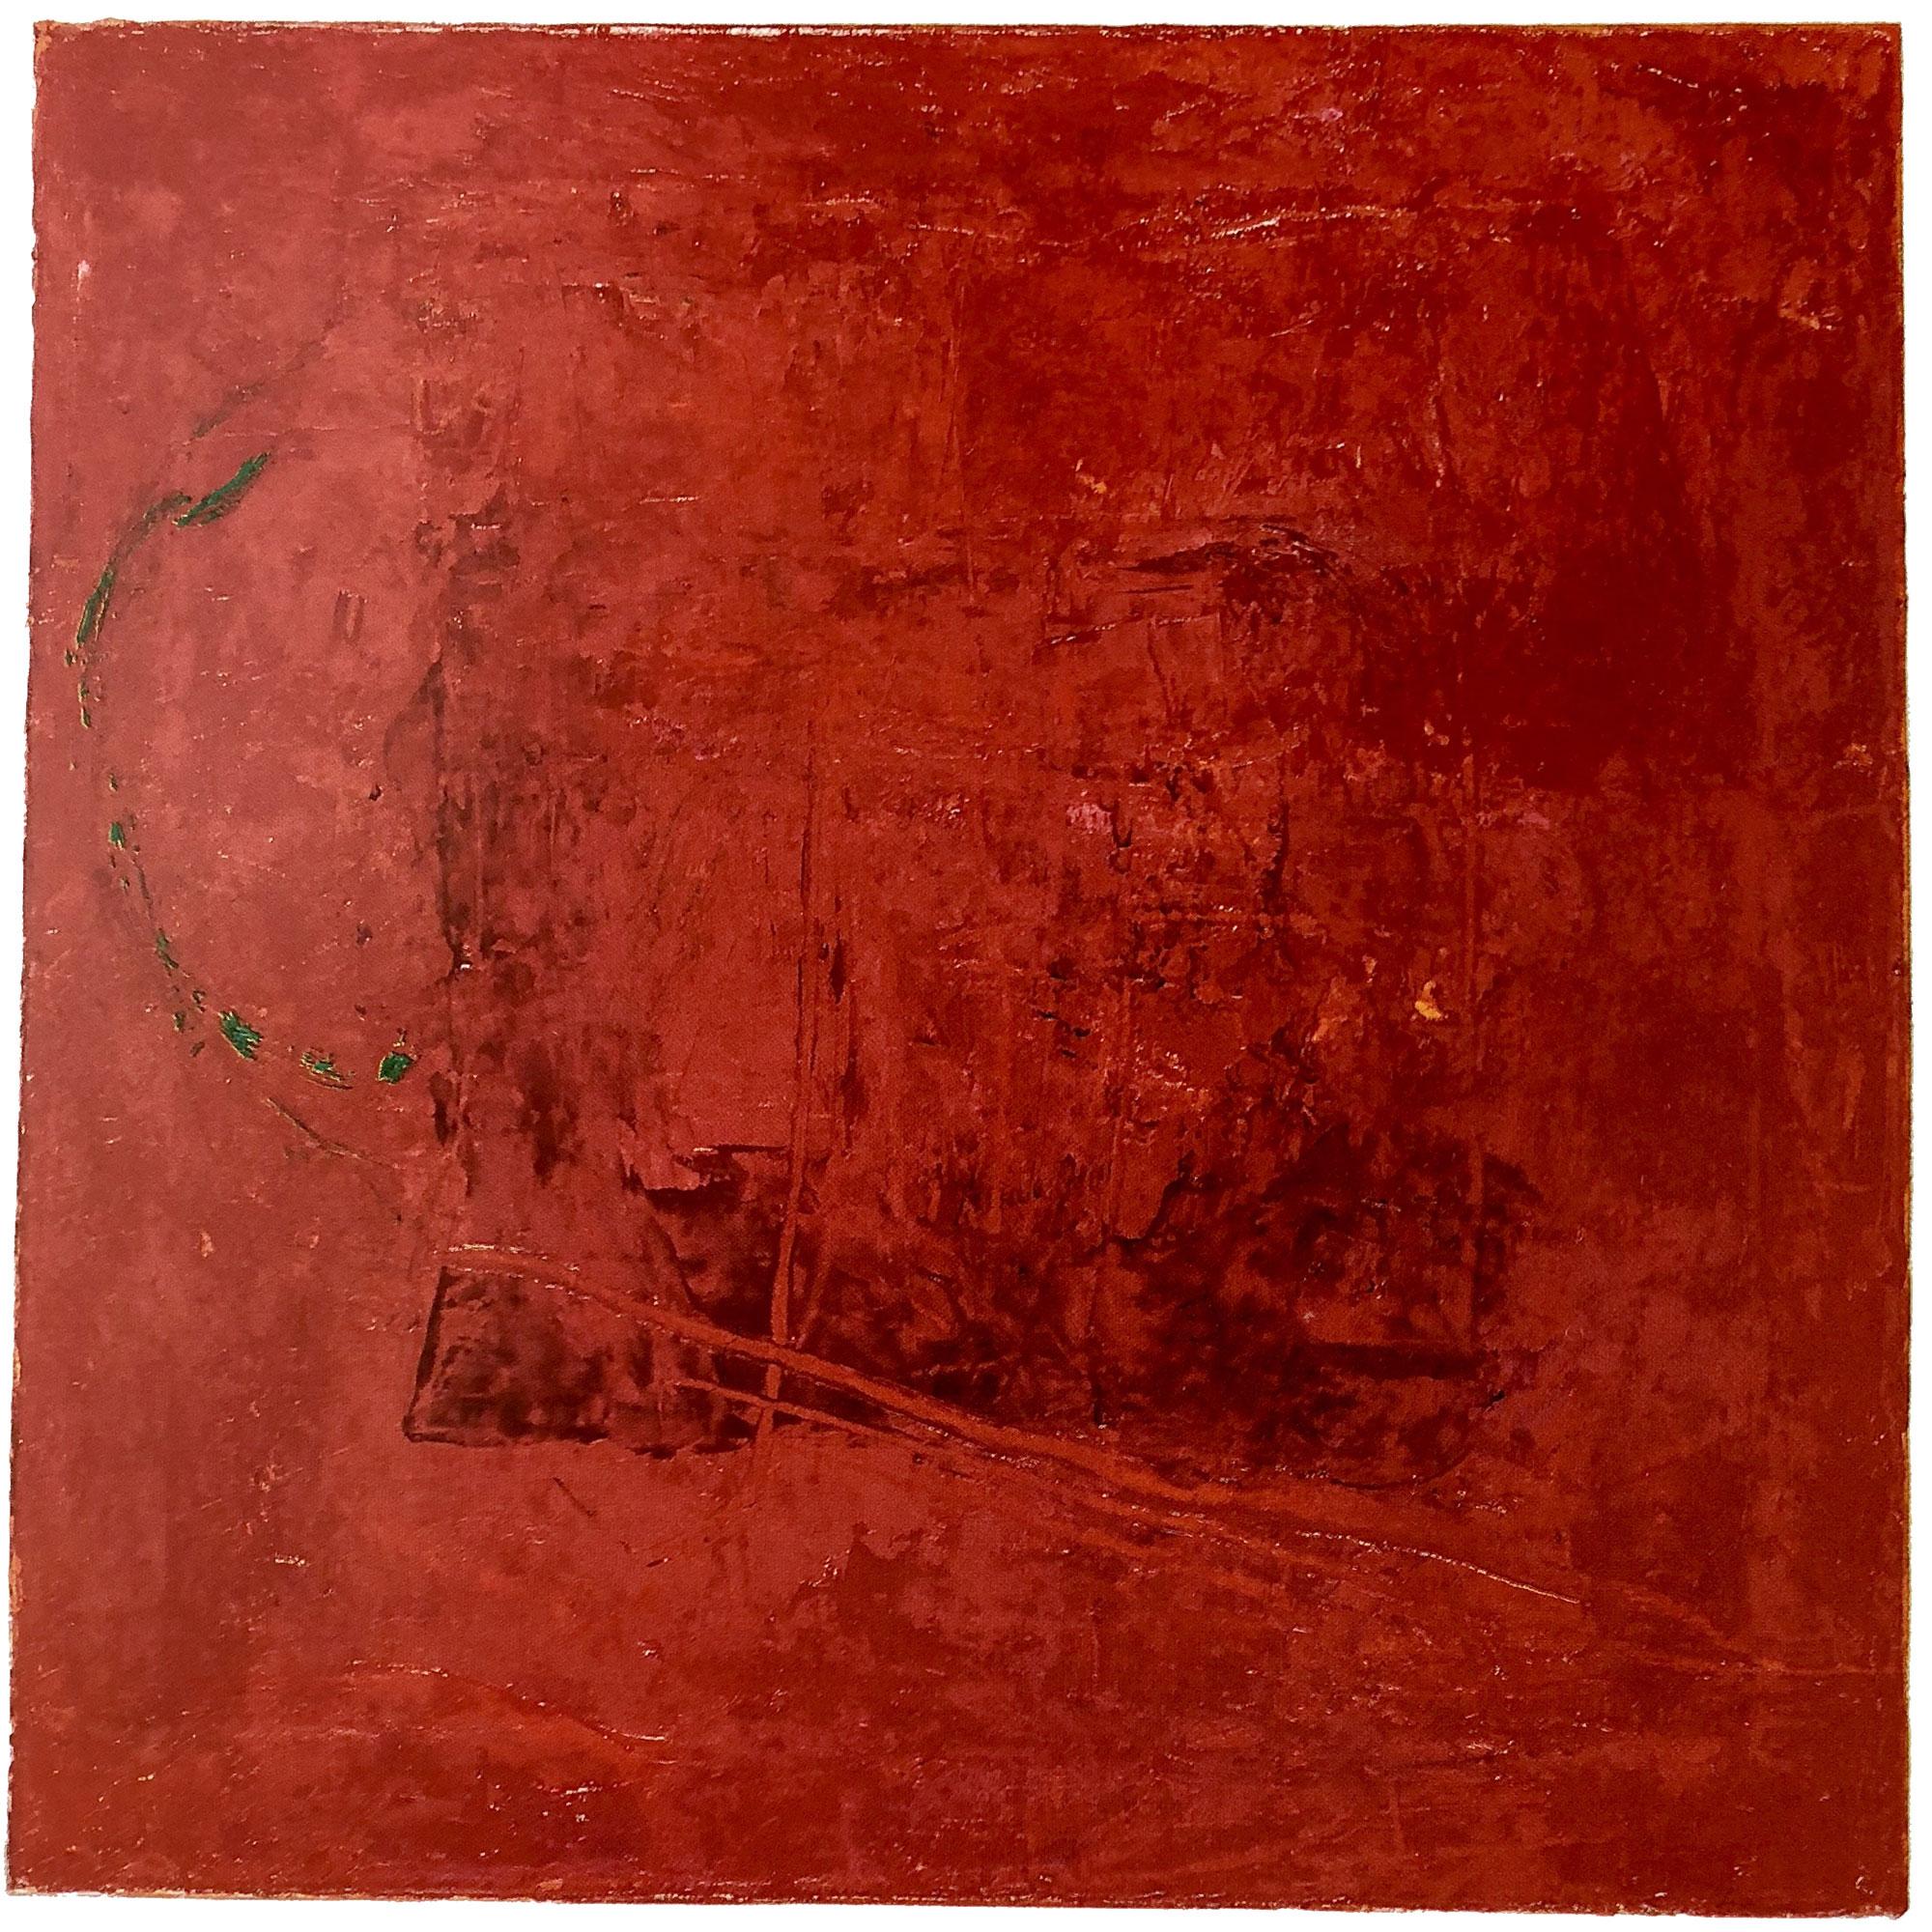 Monochrom-ohne-Titel-4-Öl-auf-Leinwand-60×60-1995